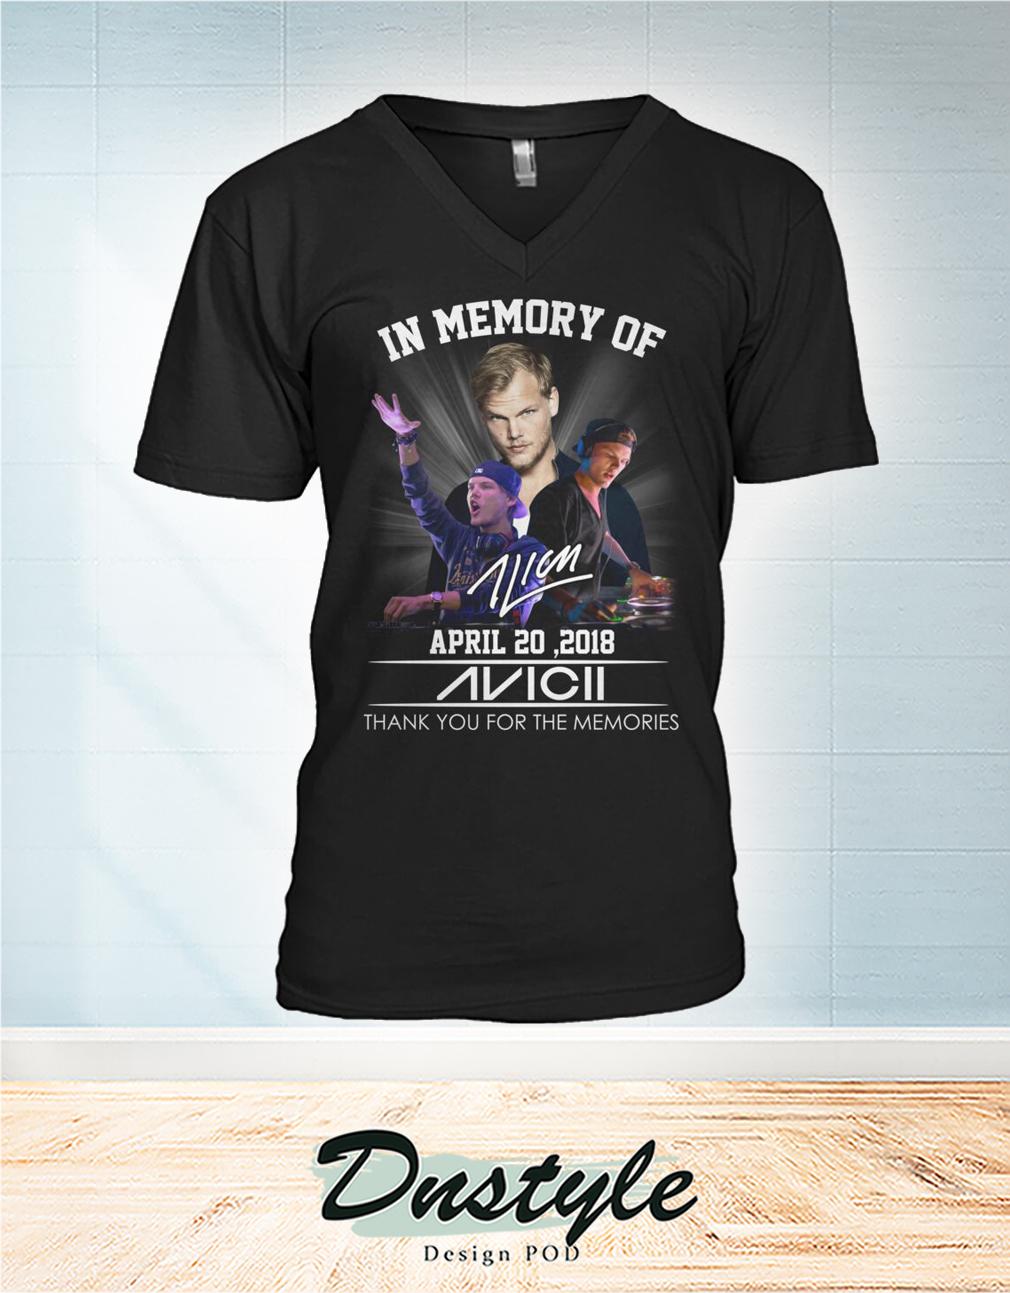 In memory of Avicii april 20 2018 thank you for the memories v-neck